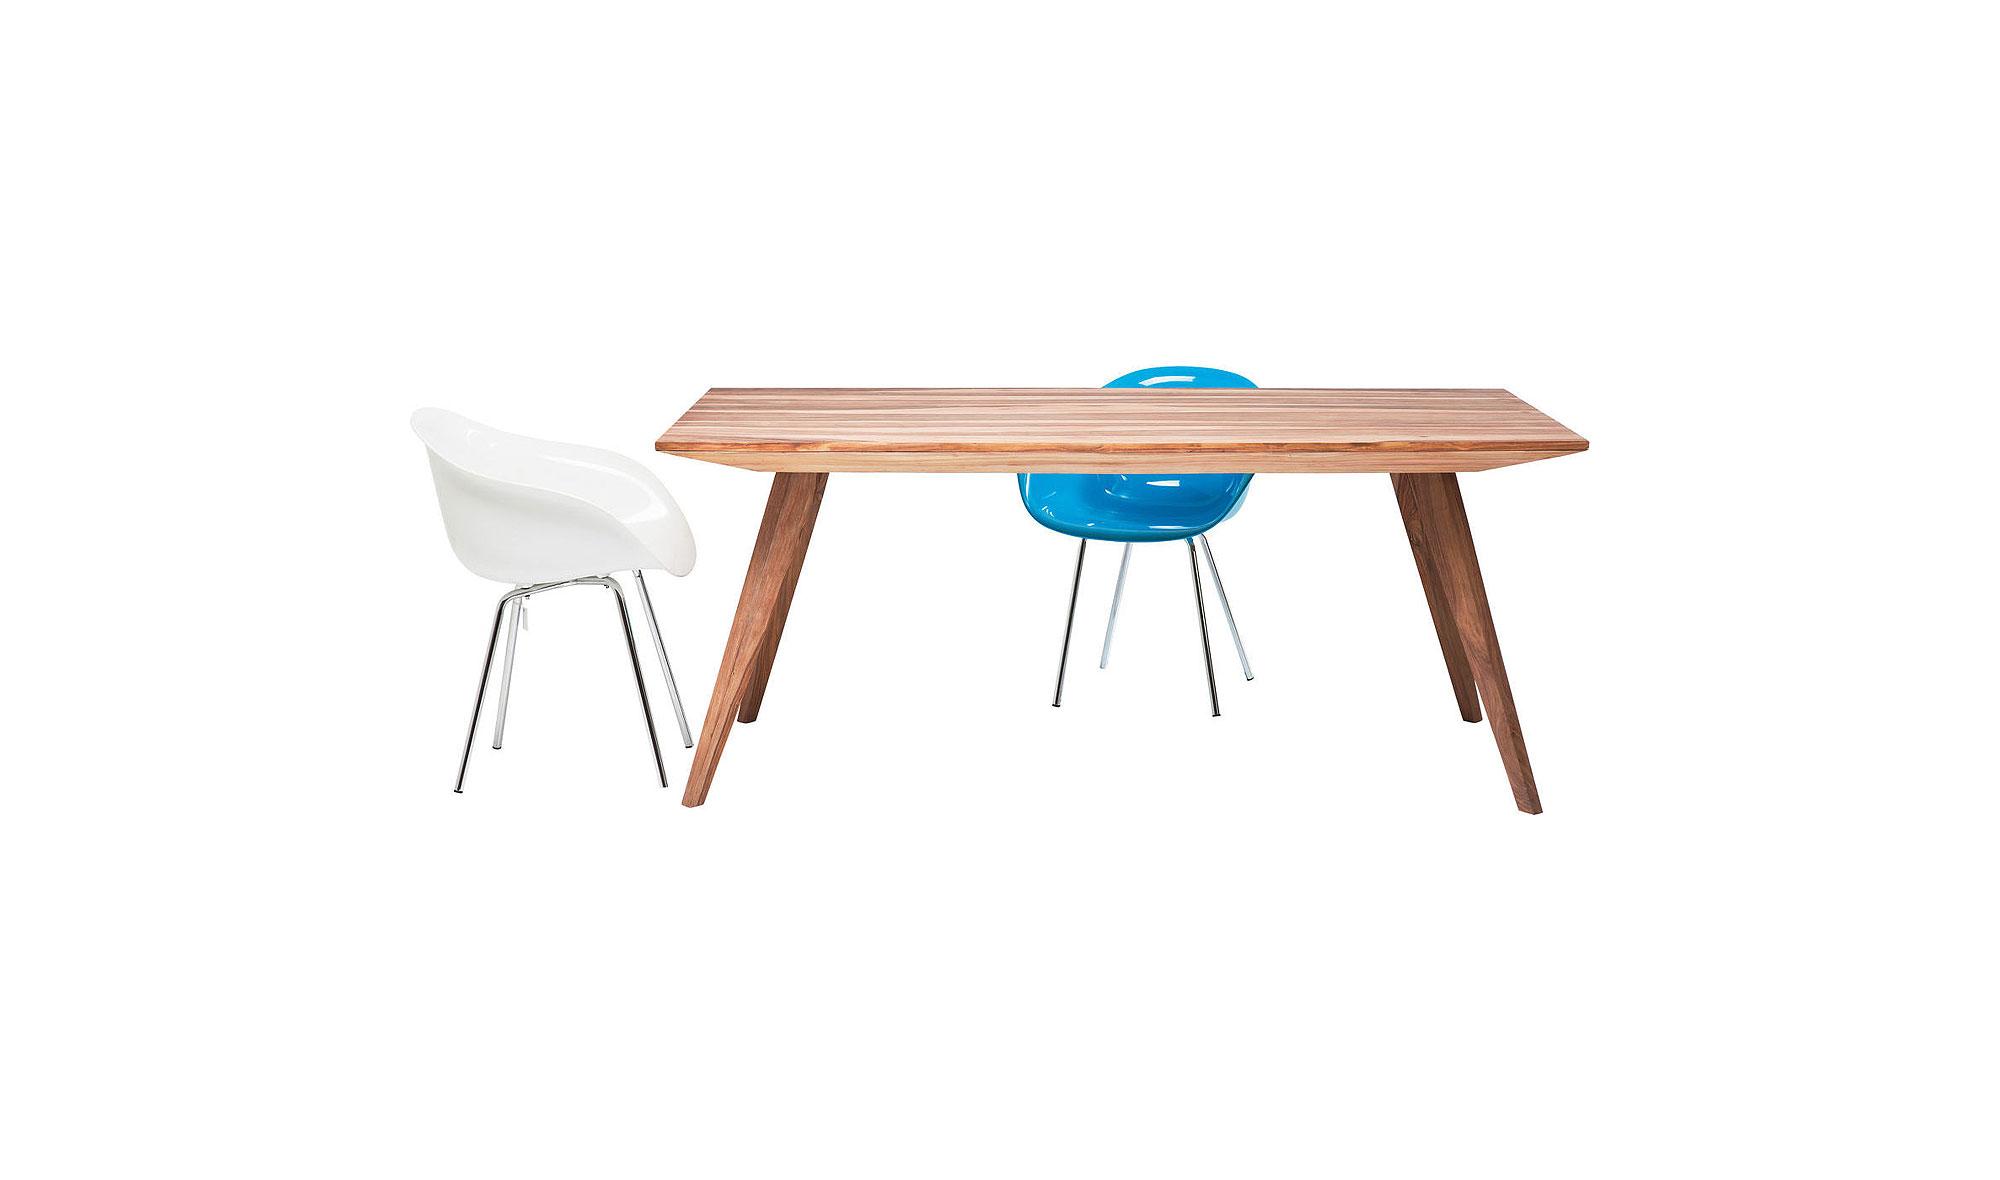 Mesa comedor madera n rdica valencia en for Muebles shena valencia